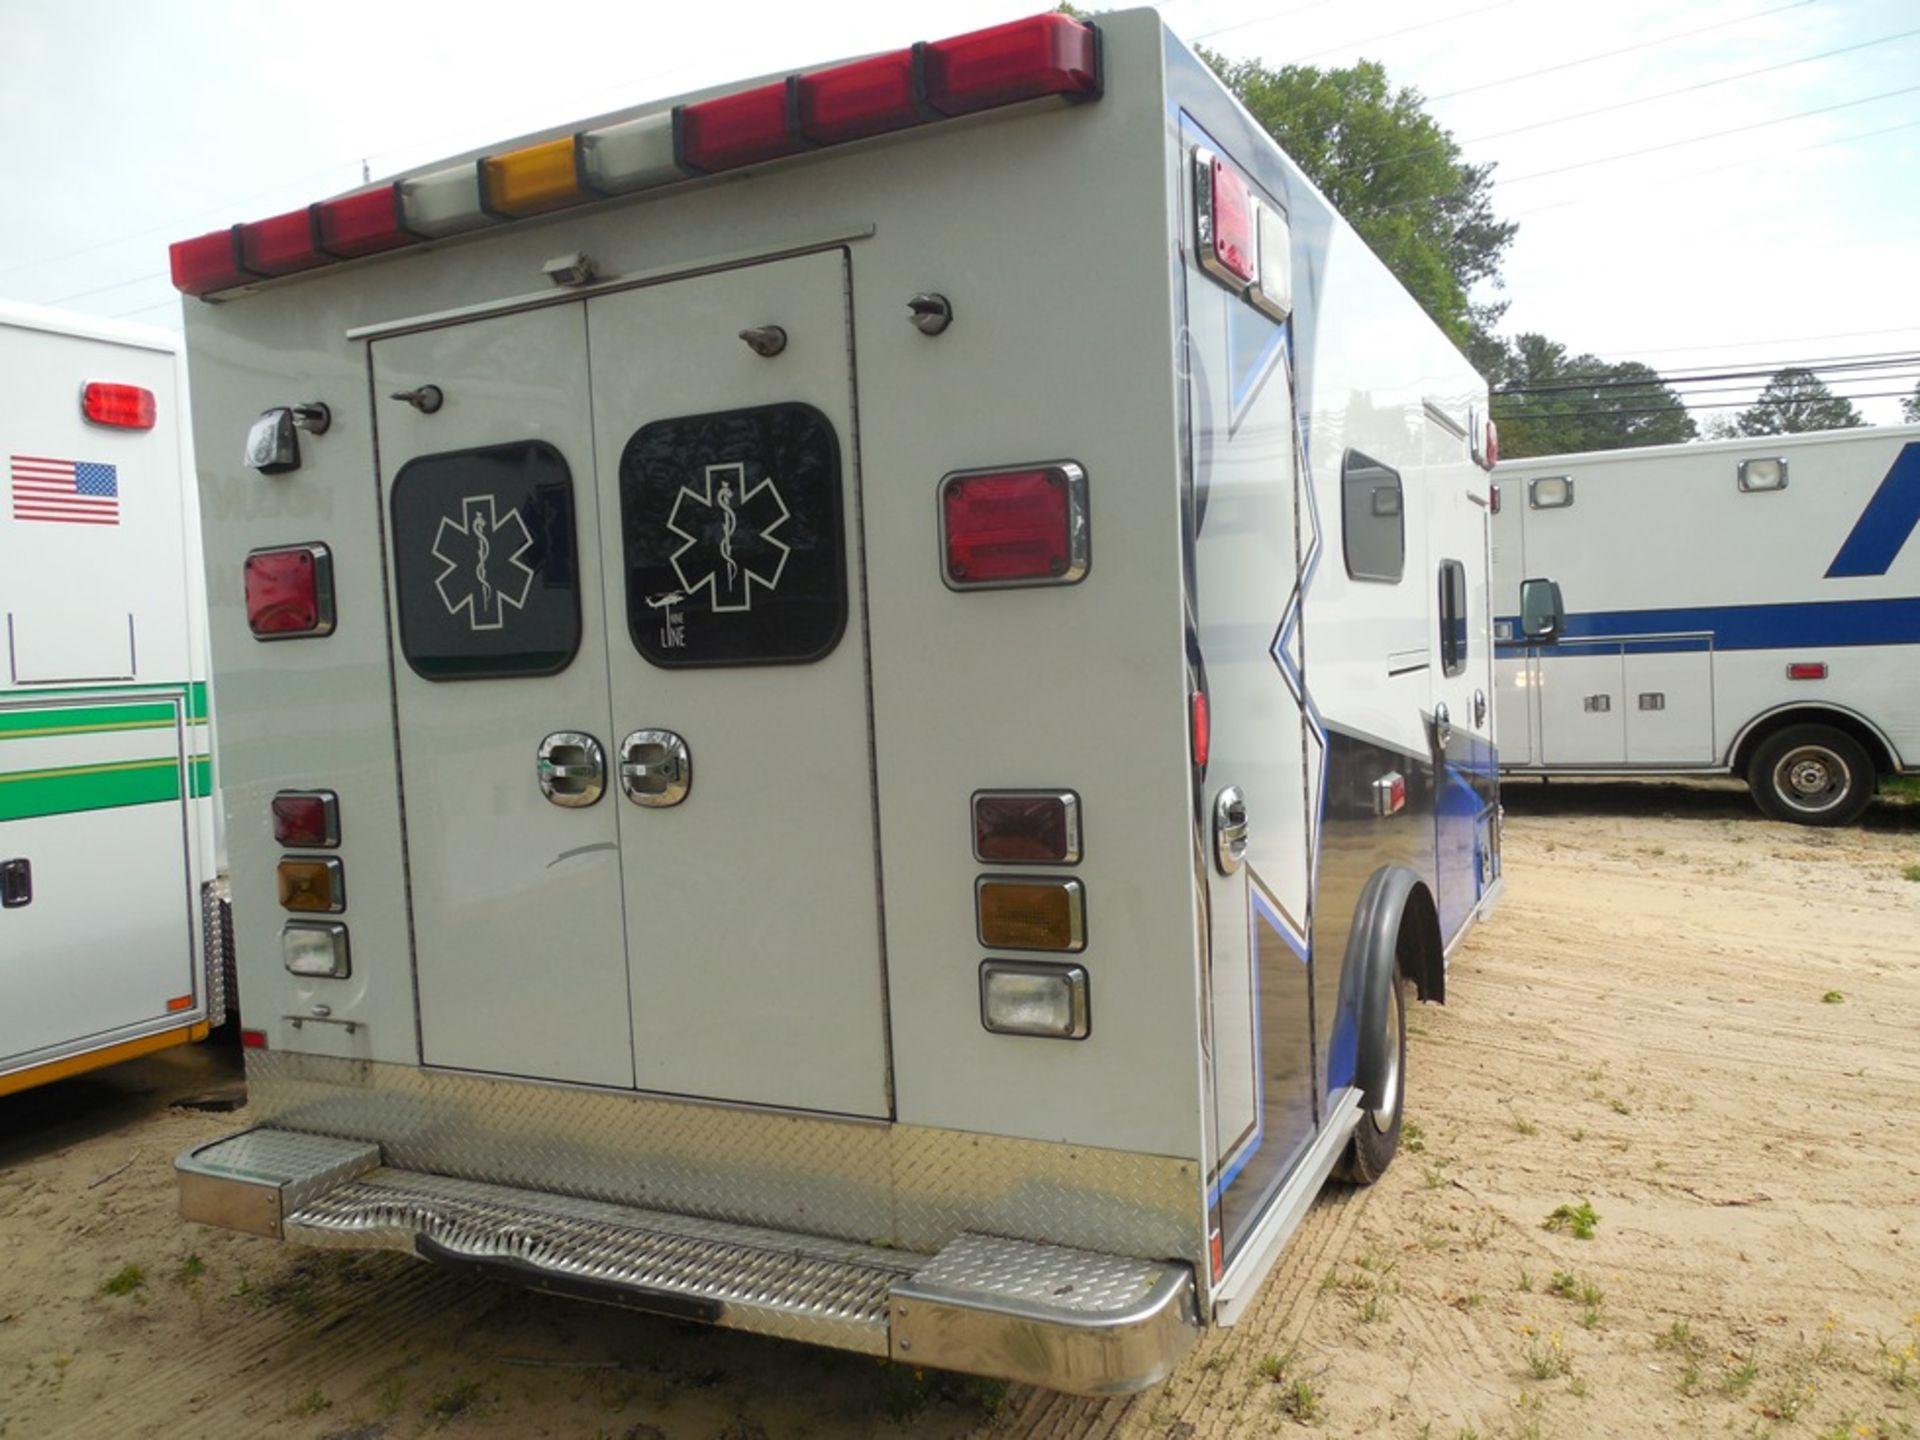 2011 Chev dsl. box ambulance Baun Body 202,680 miles vin# 1GB6G5CL5B1141656 - Image 4 of 6